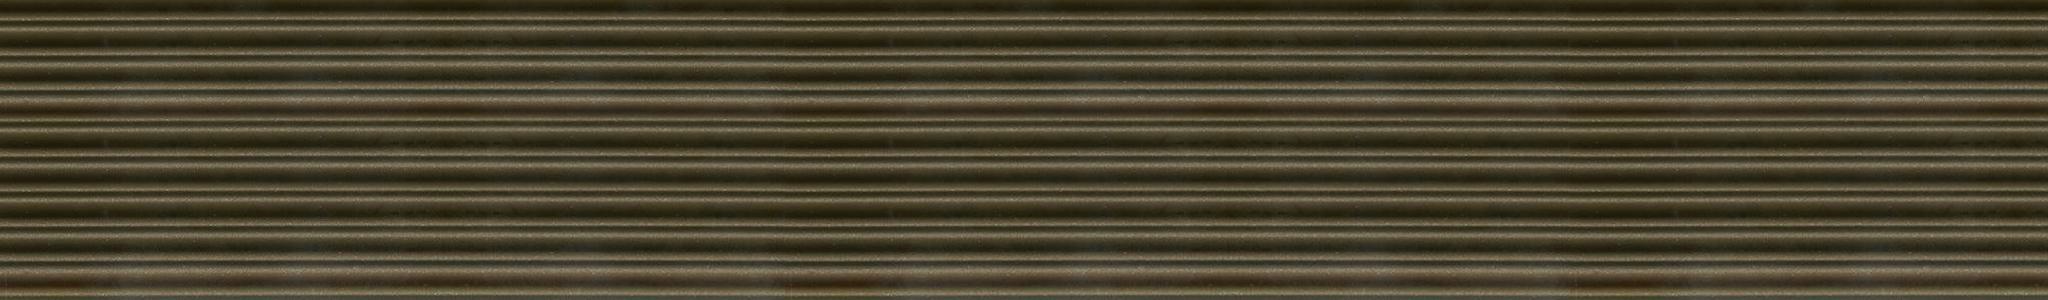 HD 29278 Akryl 3D hrana bronz wave